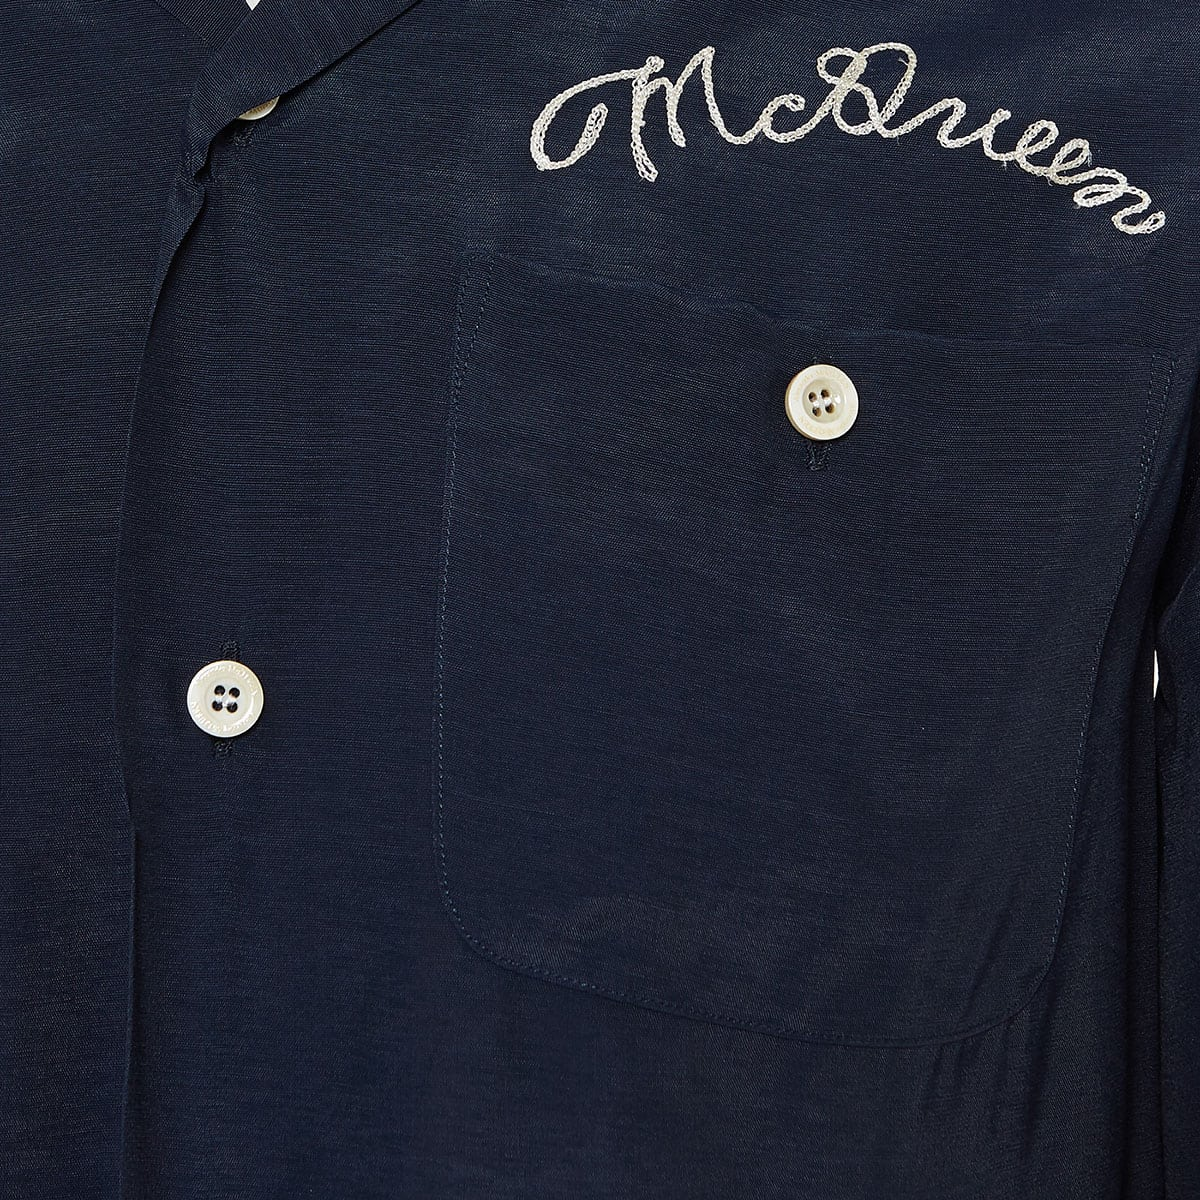 Oversized short-sleeved logo shirt